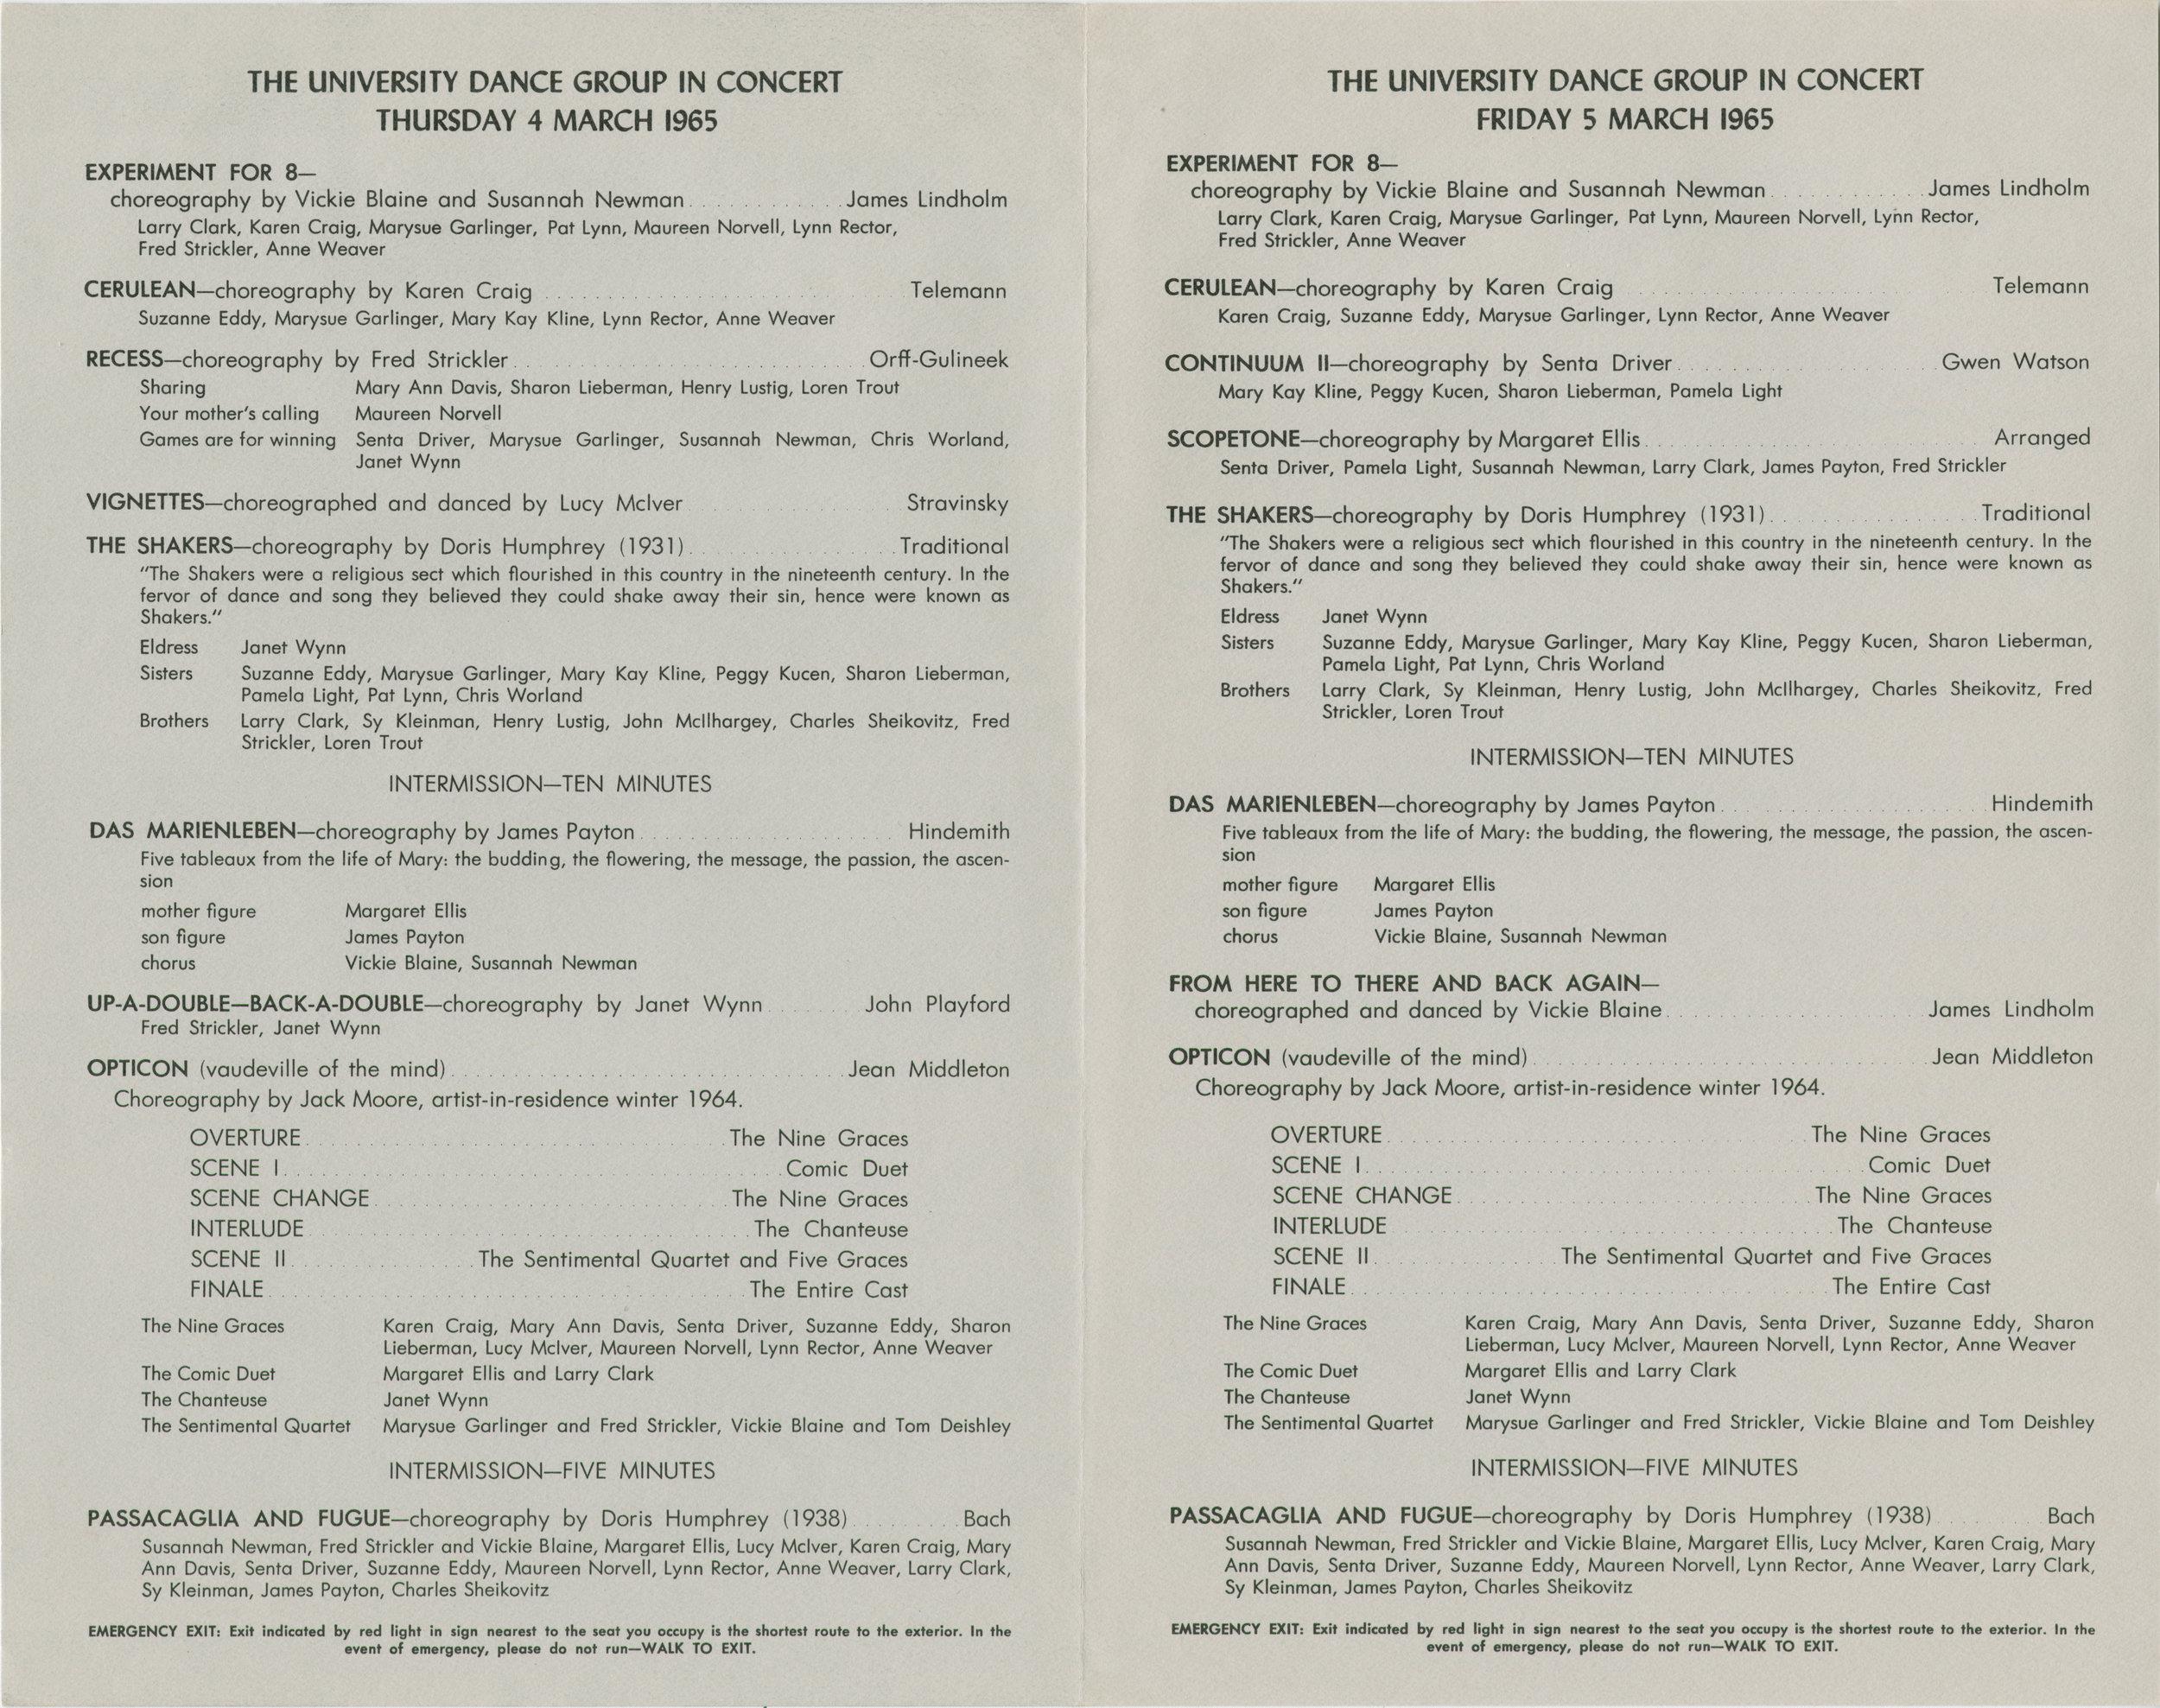 UDG_1965_DancePrograms-001-02.jpg